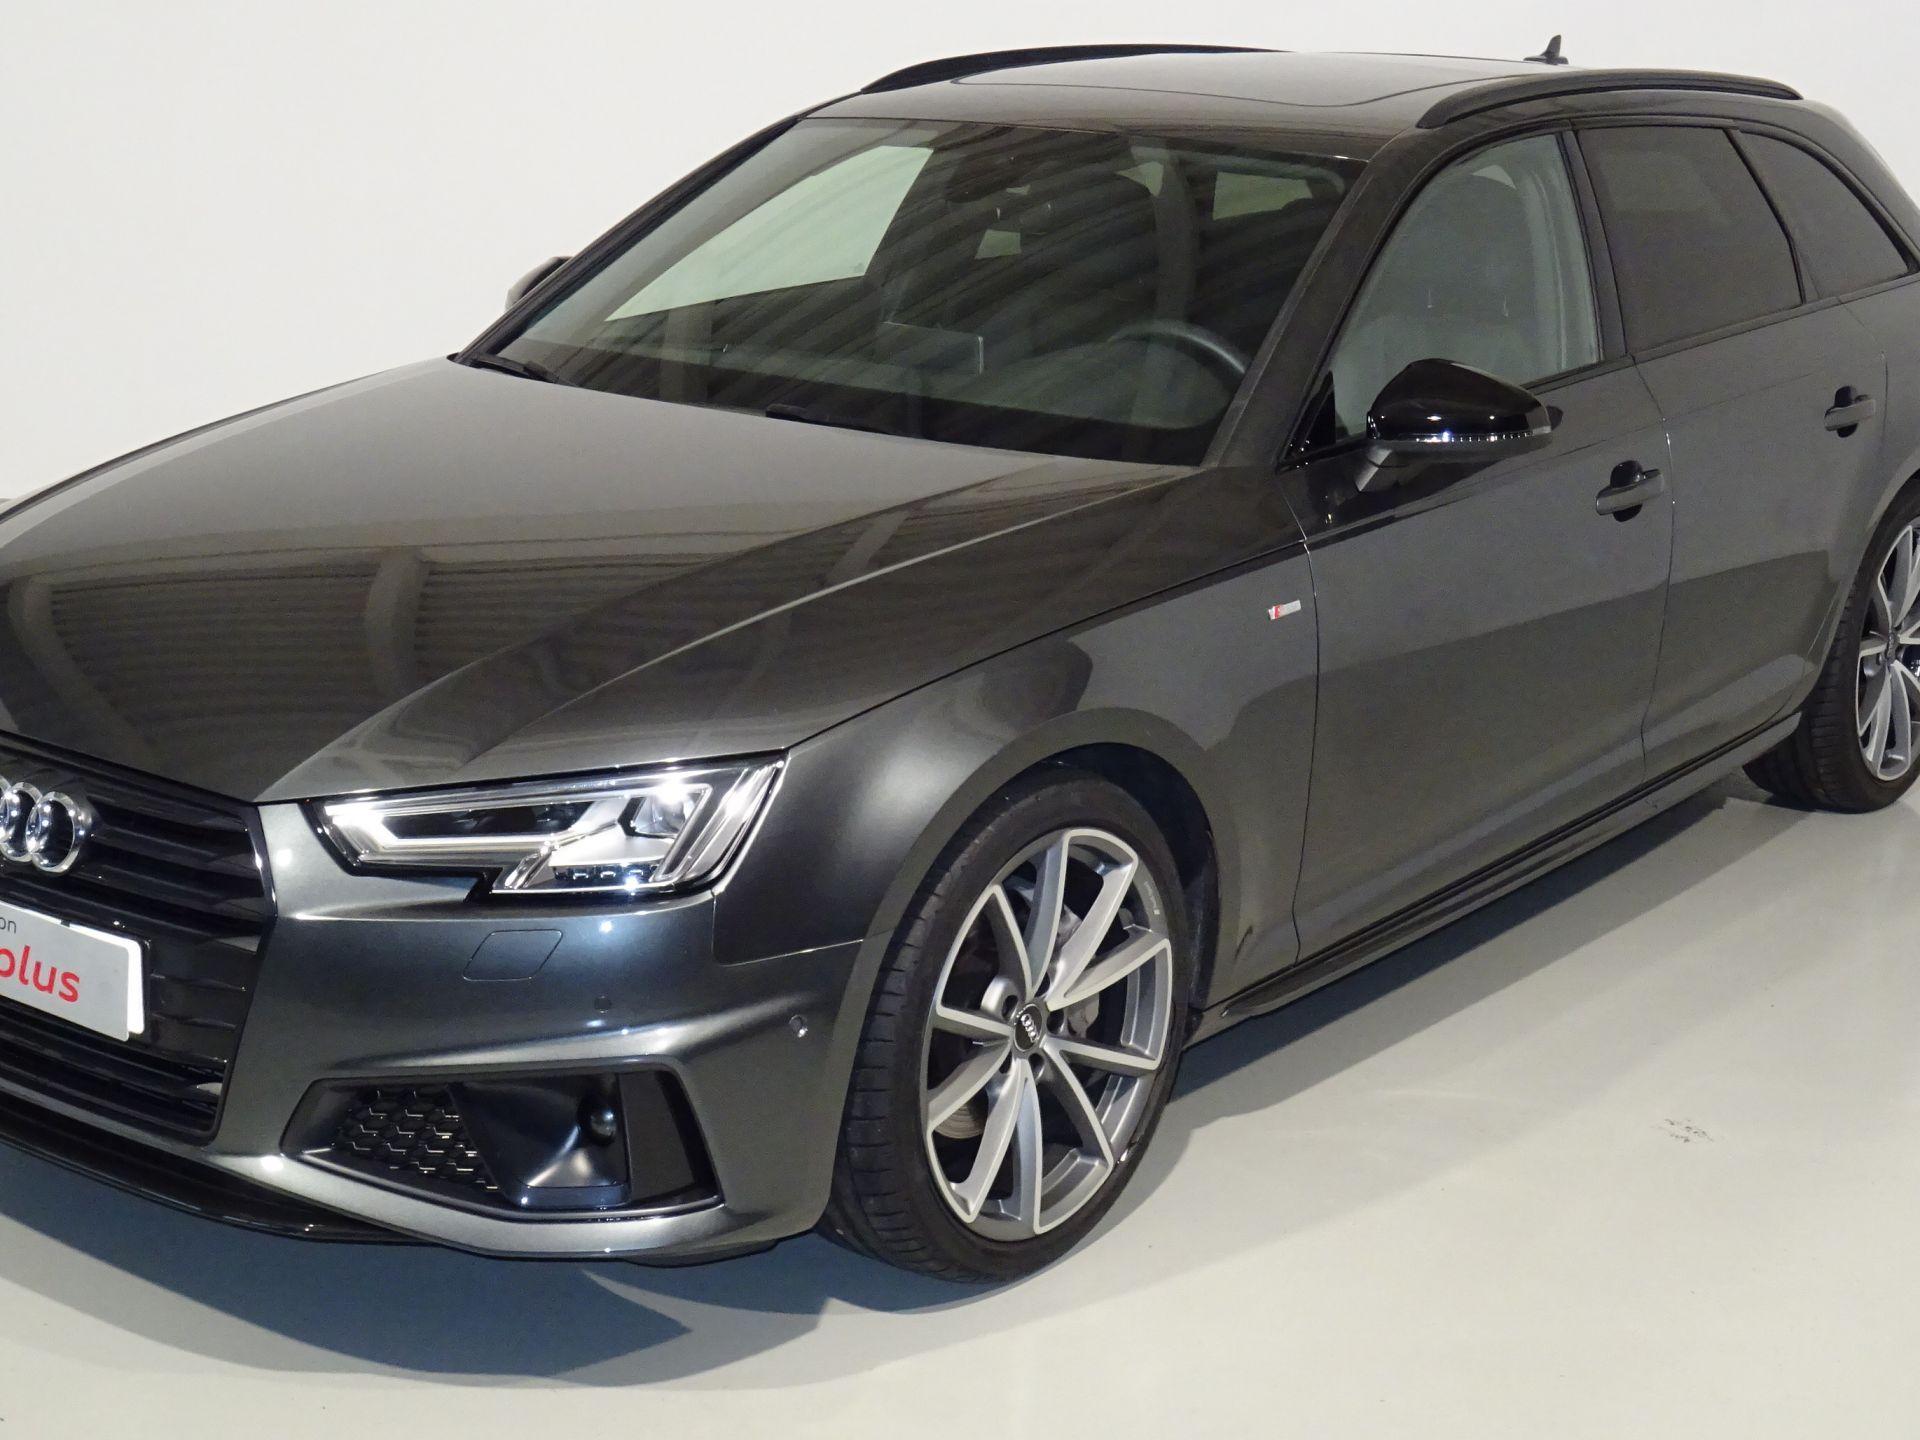 Audi A4 Avant Black line 40 TDI 140kW quat S tro